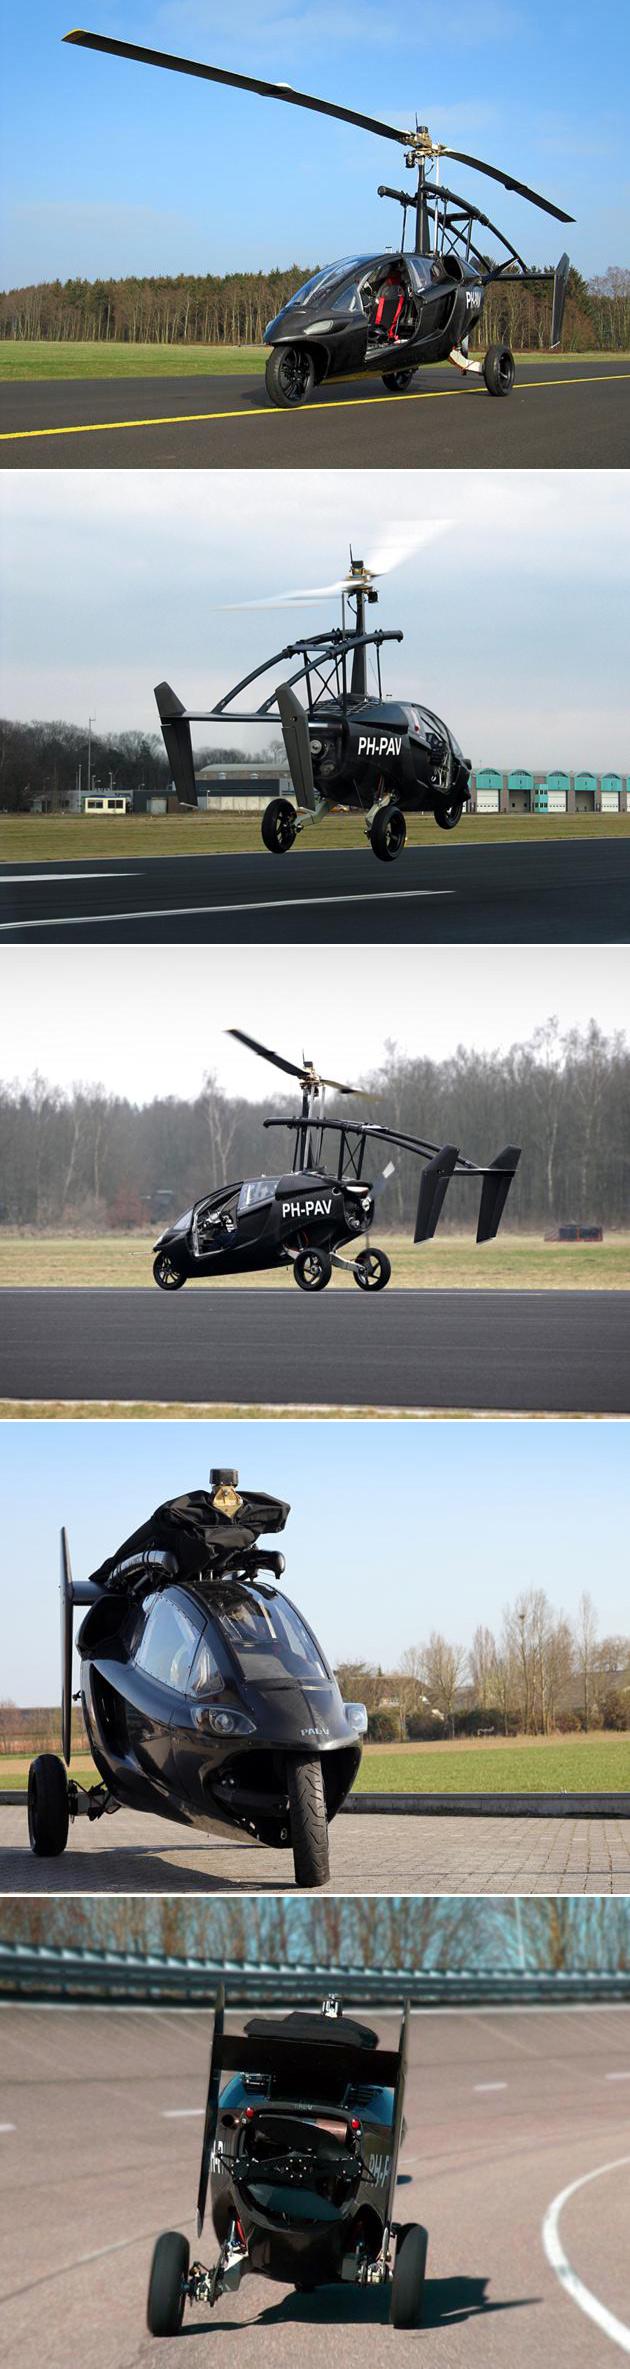 pal-v-flying-car